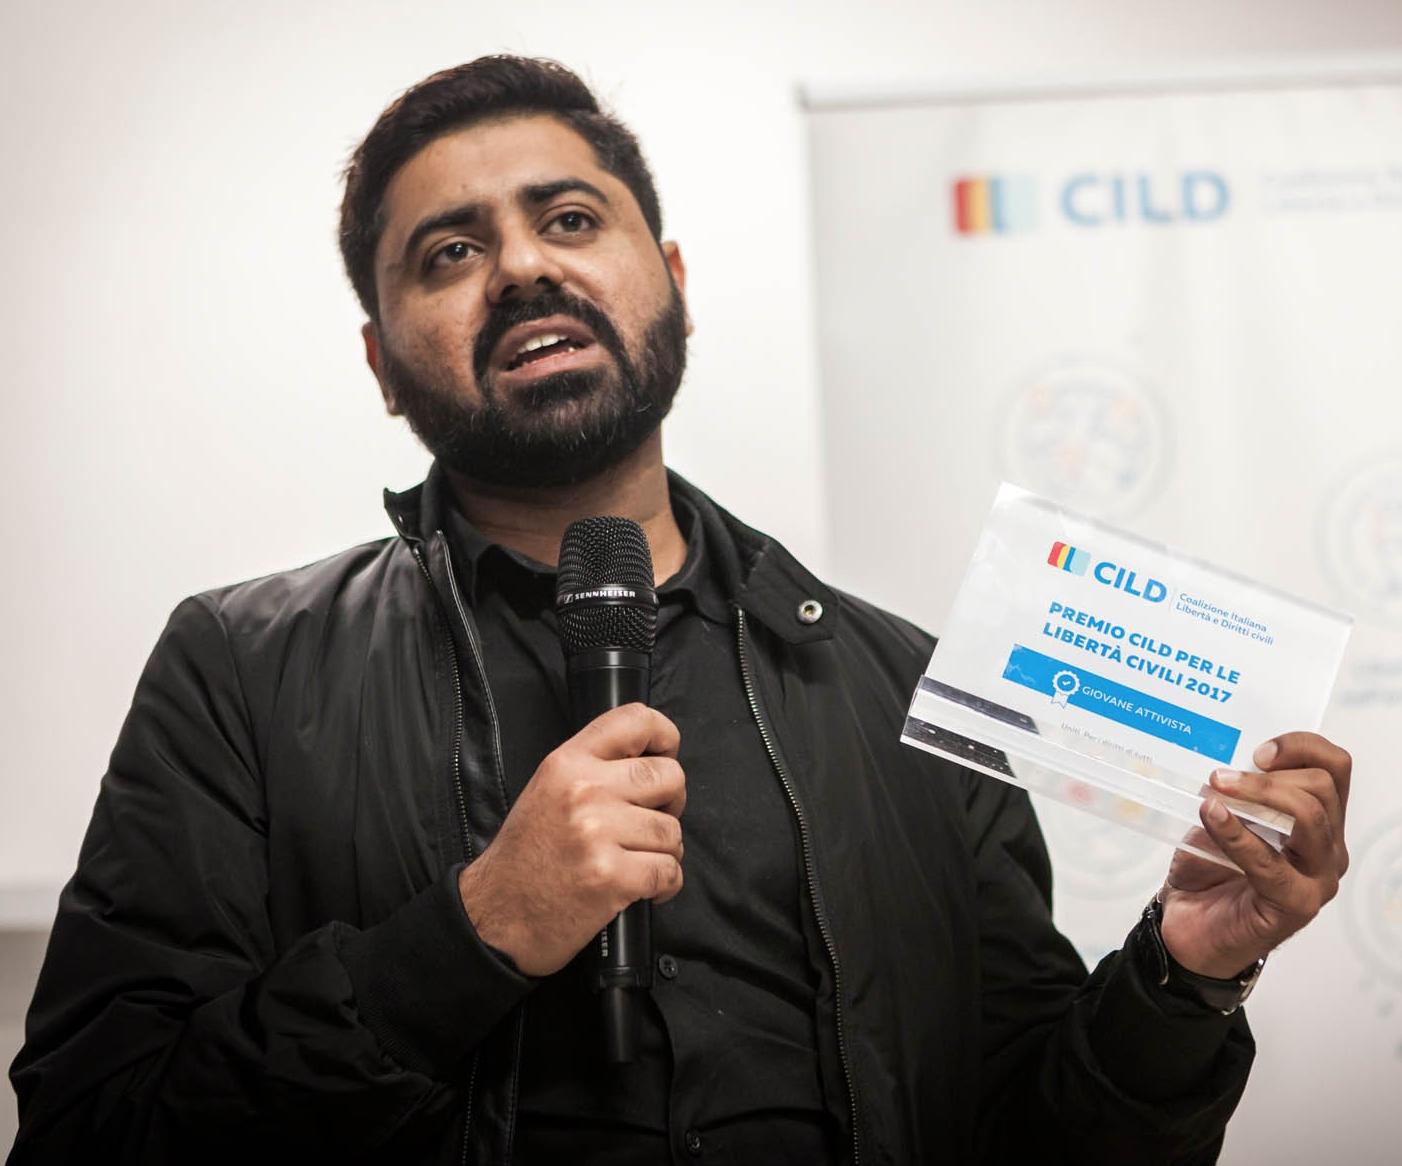 Wajahat Abbas Kazmi with notification of his award.